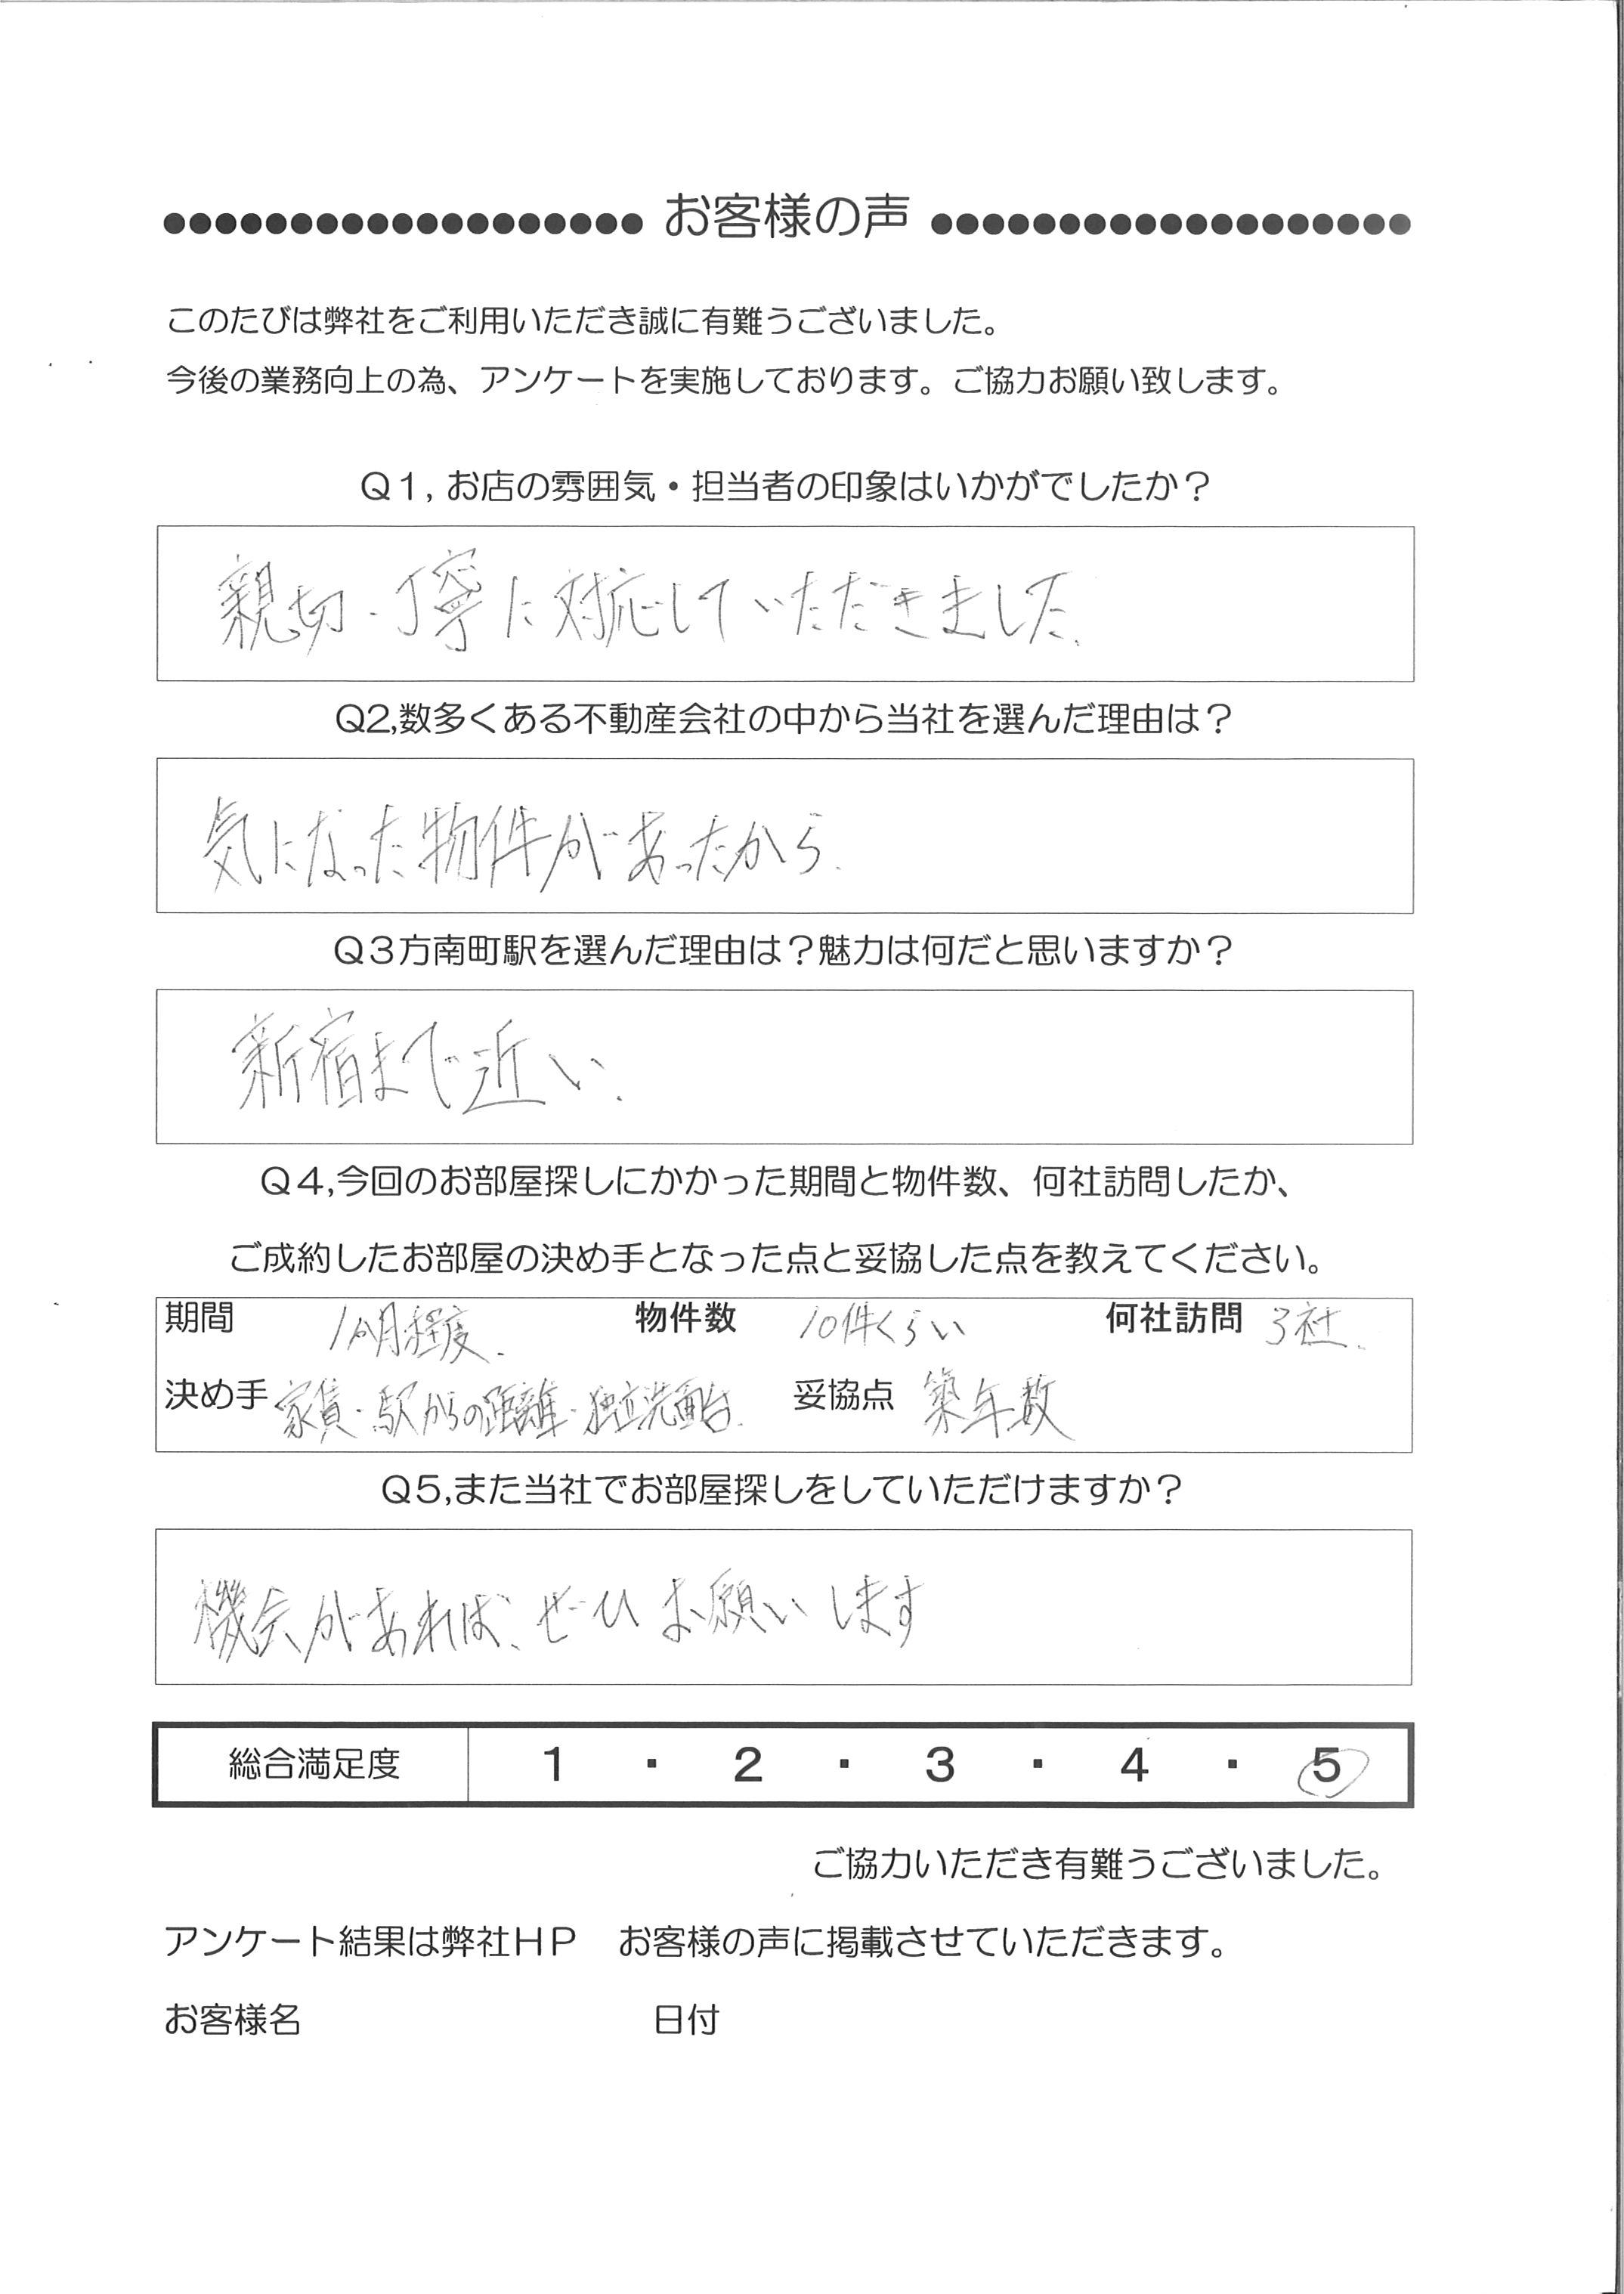 S・K 様 (22歳)男性(学生)アンケート回答